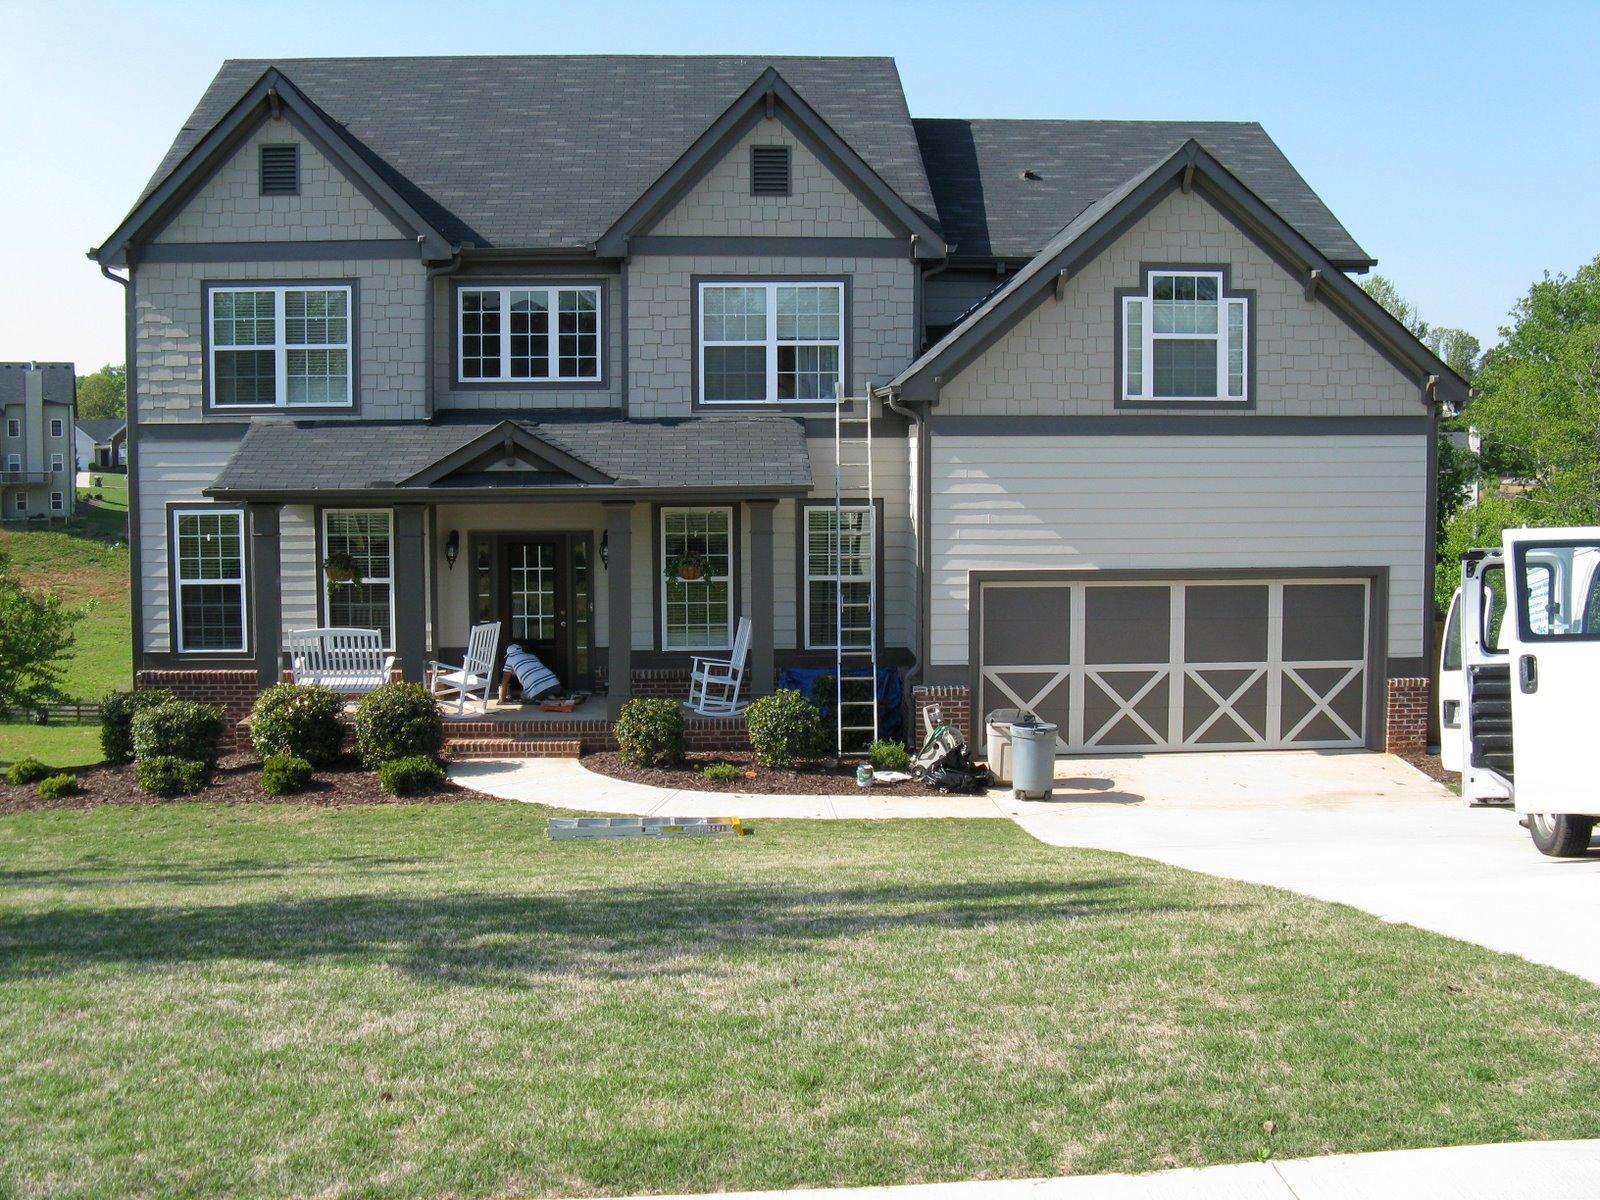 exterior paint colors for house photo - 4